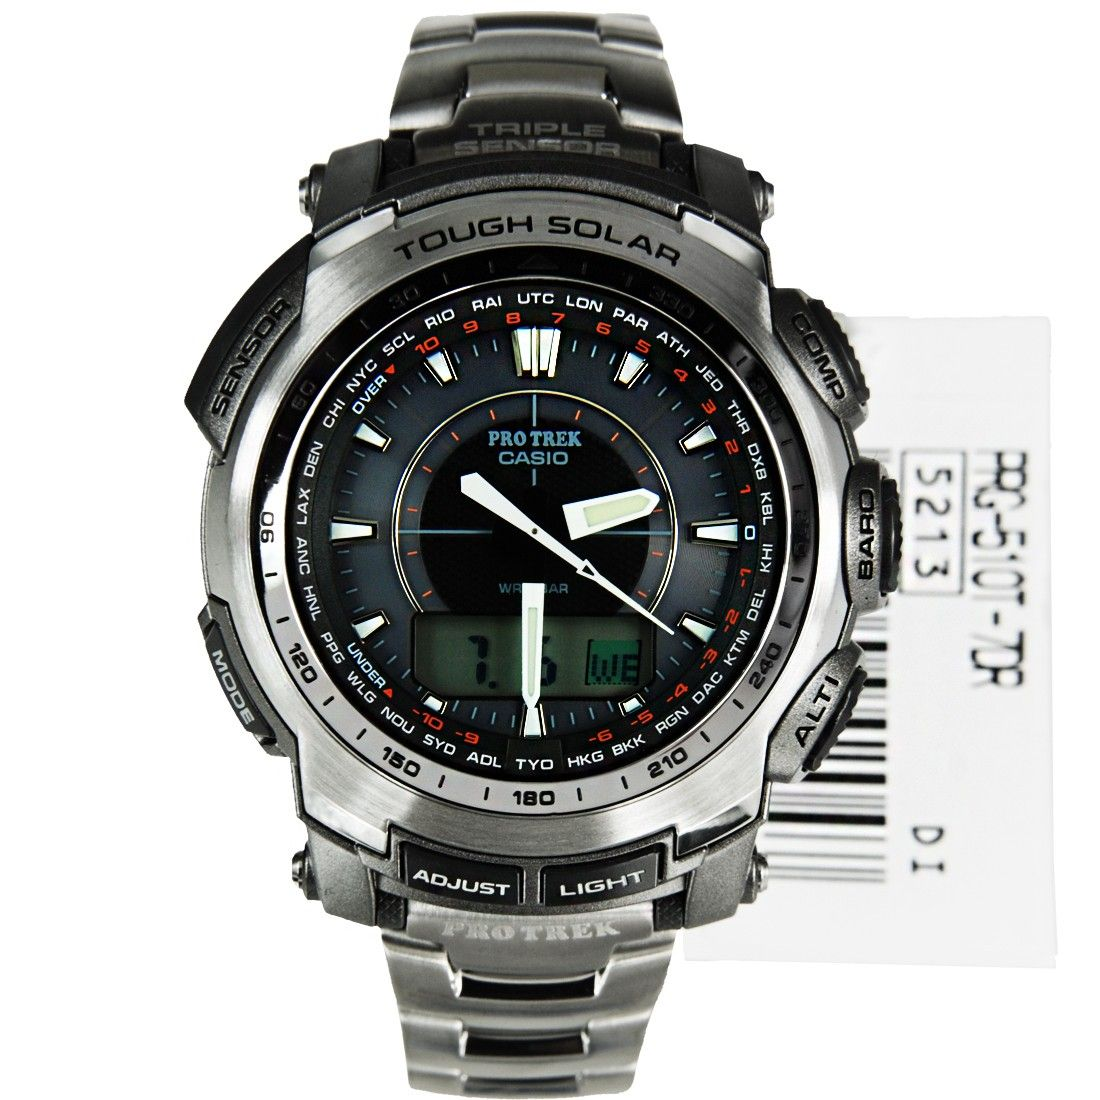 Compre Casio Protrek Titanium Men Watch PRG510T7 PRG510T